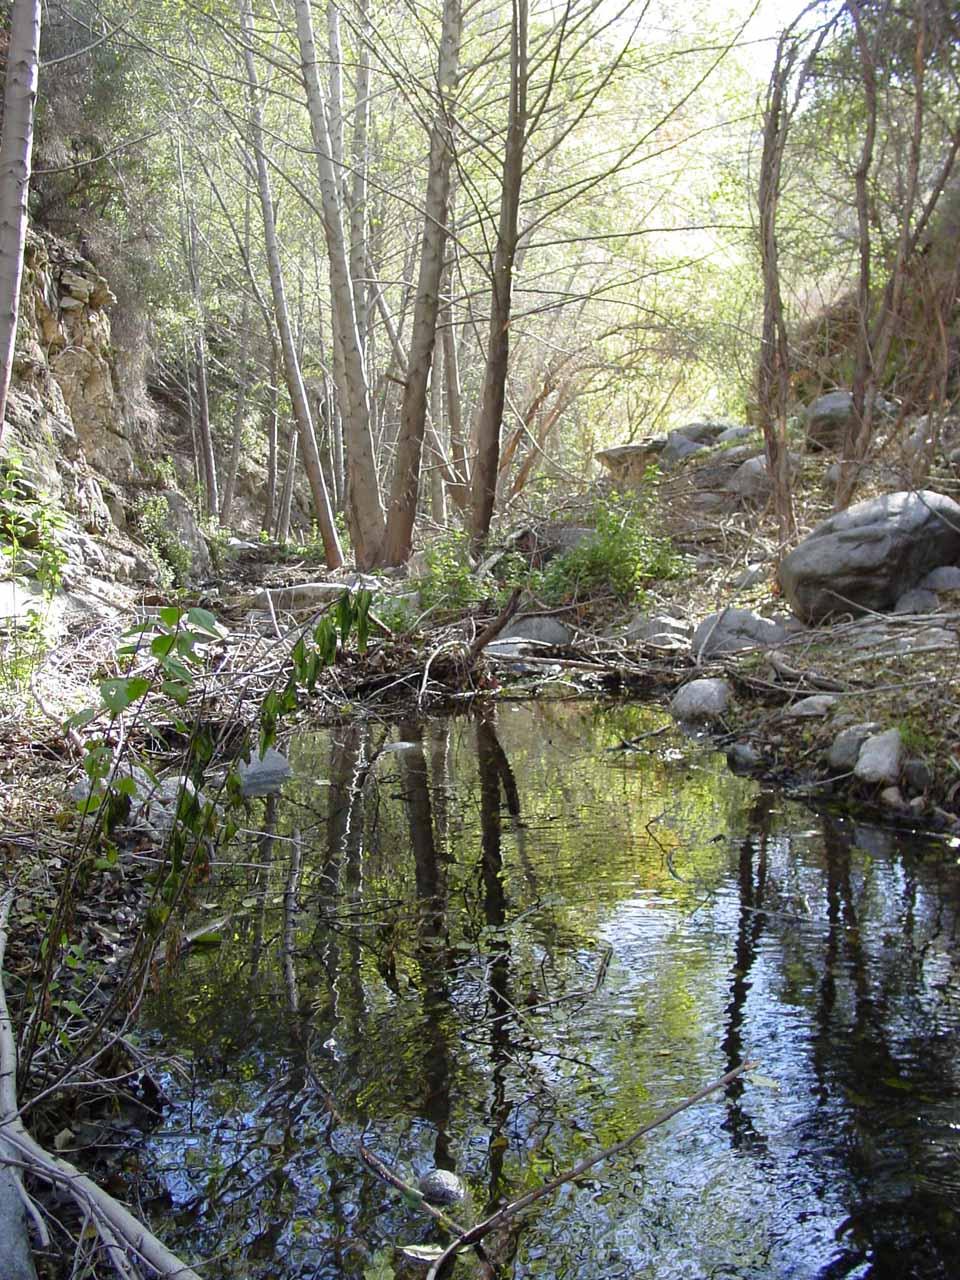 A calm pond seen along the trail